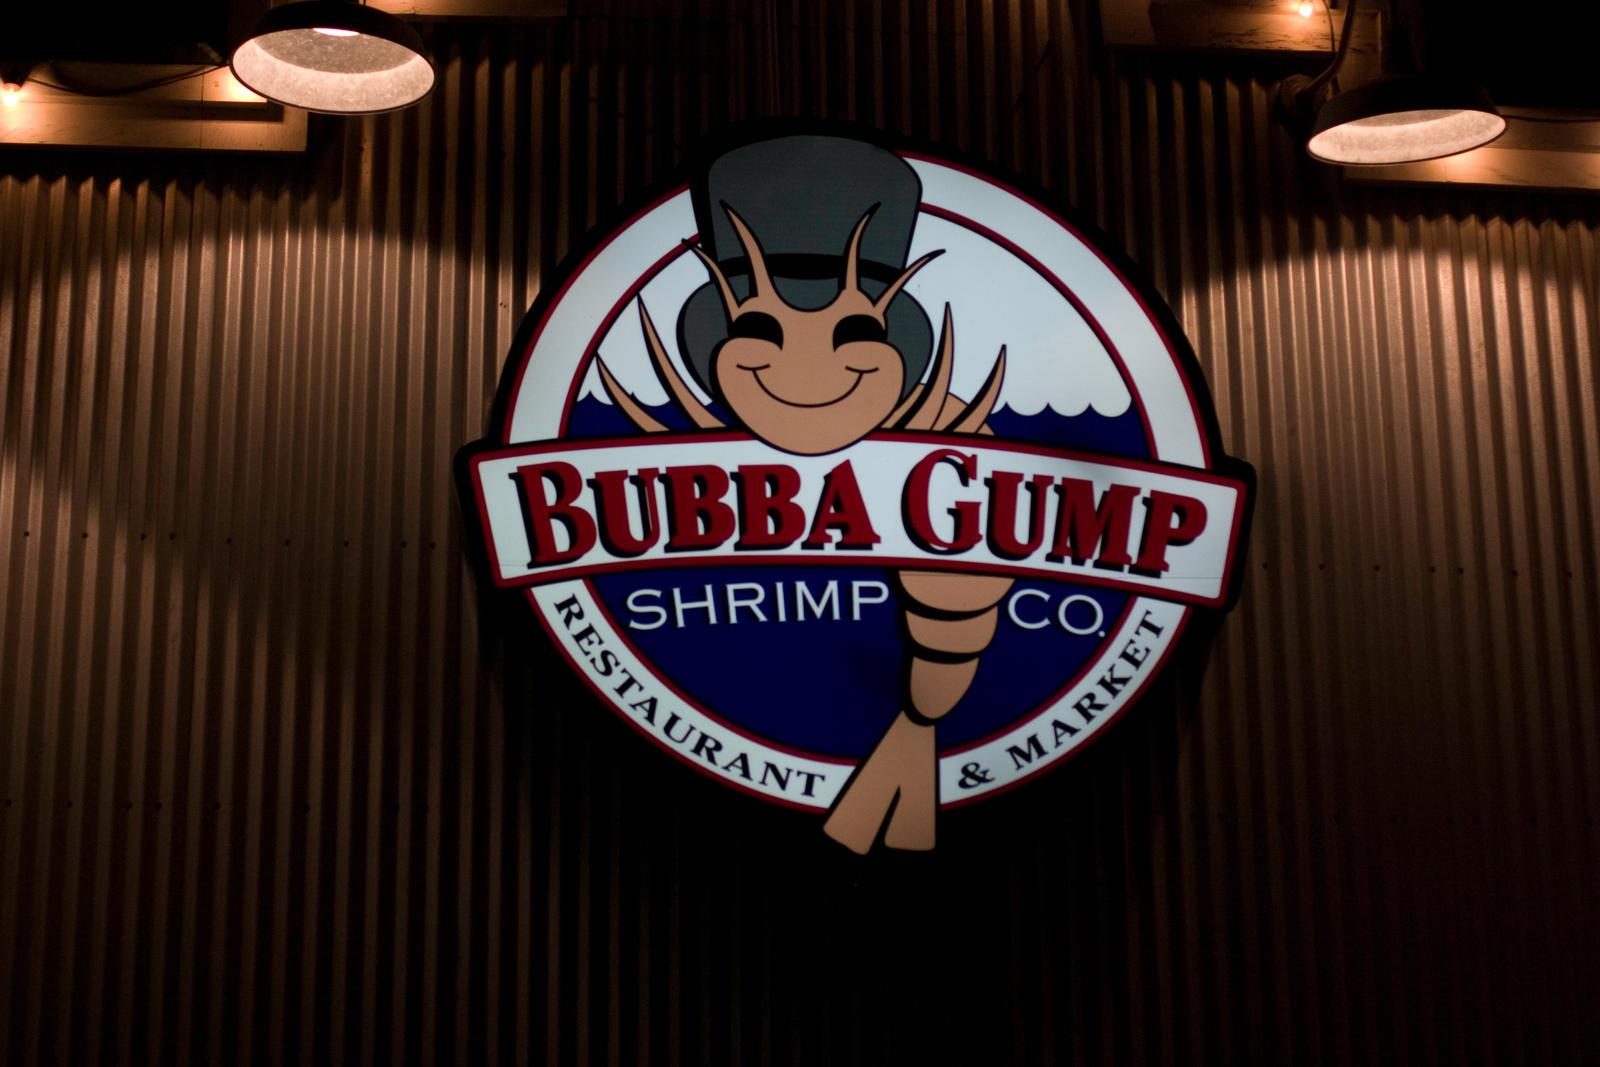 Bubba Gump Shrimp Co. by JoergJohannMueller on deviantART